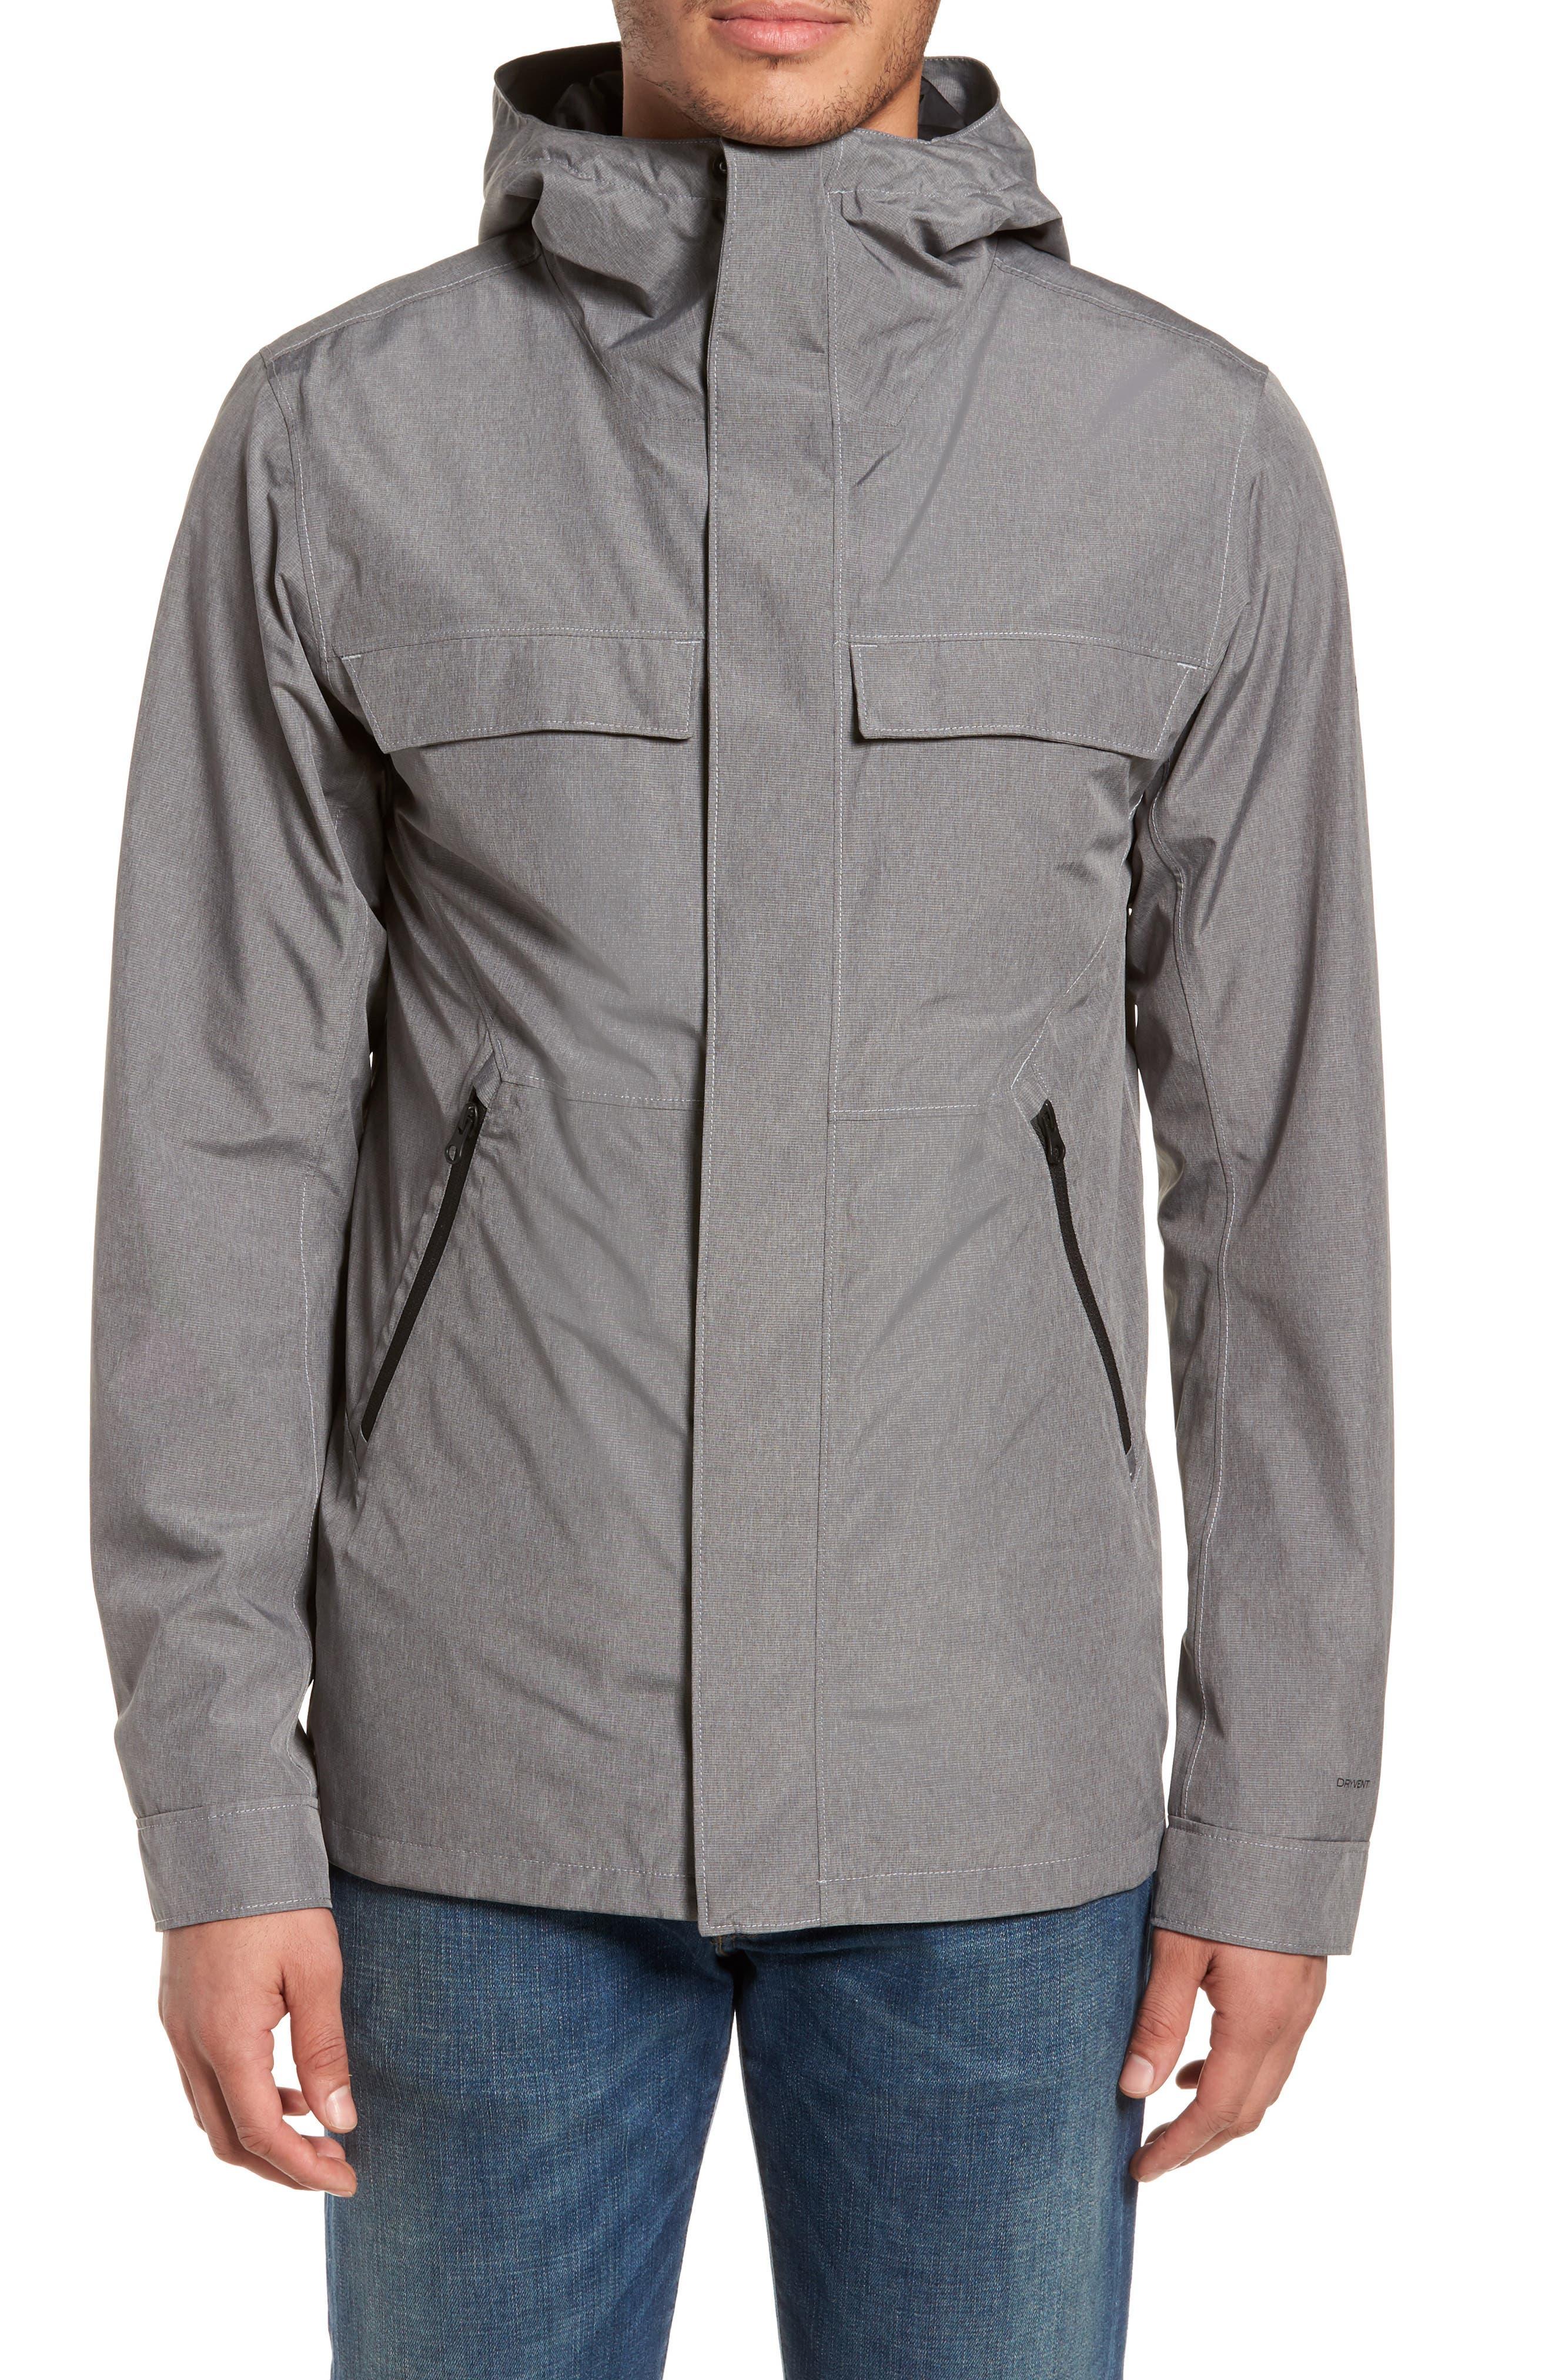 Jenison II Insulated Waterproof Jacket,                             Alternate thumbnail 4, color,                             TNF MEDIUM GREY HEATHER